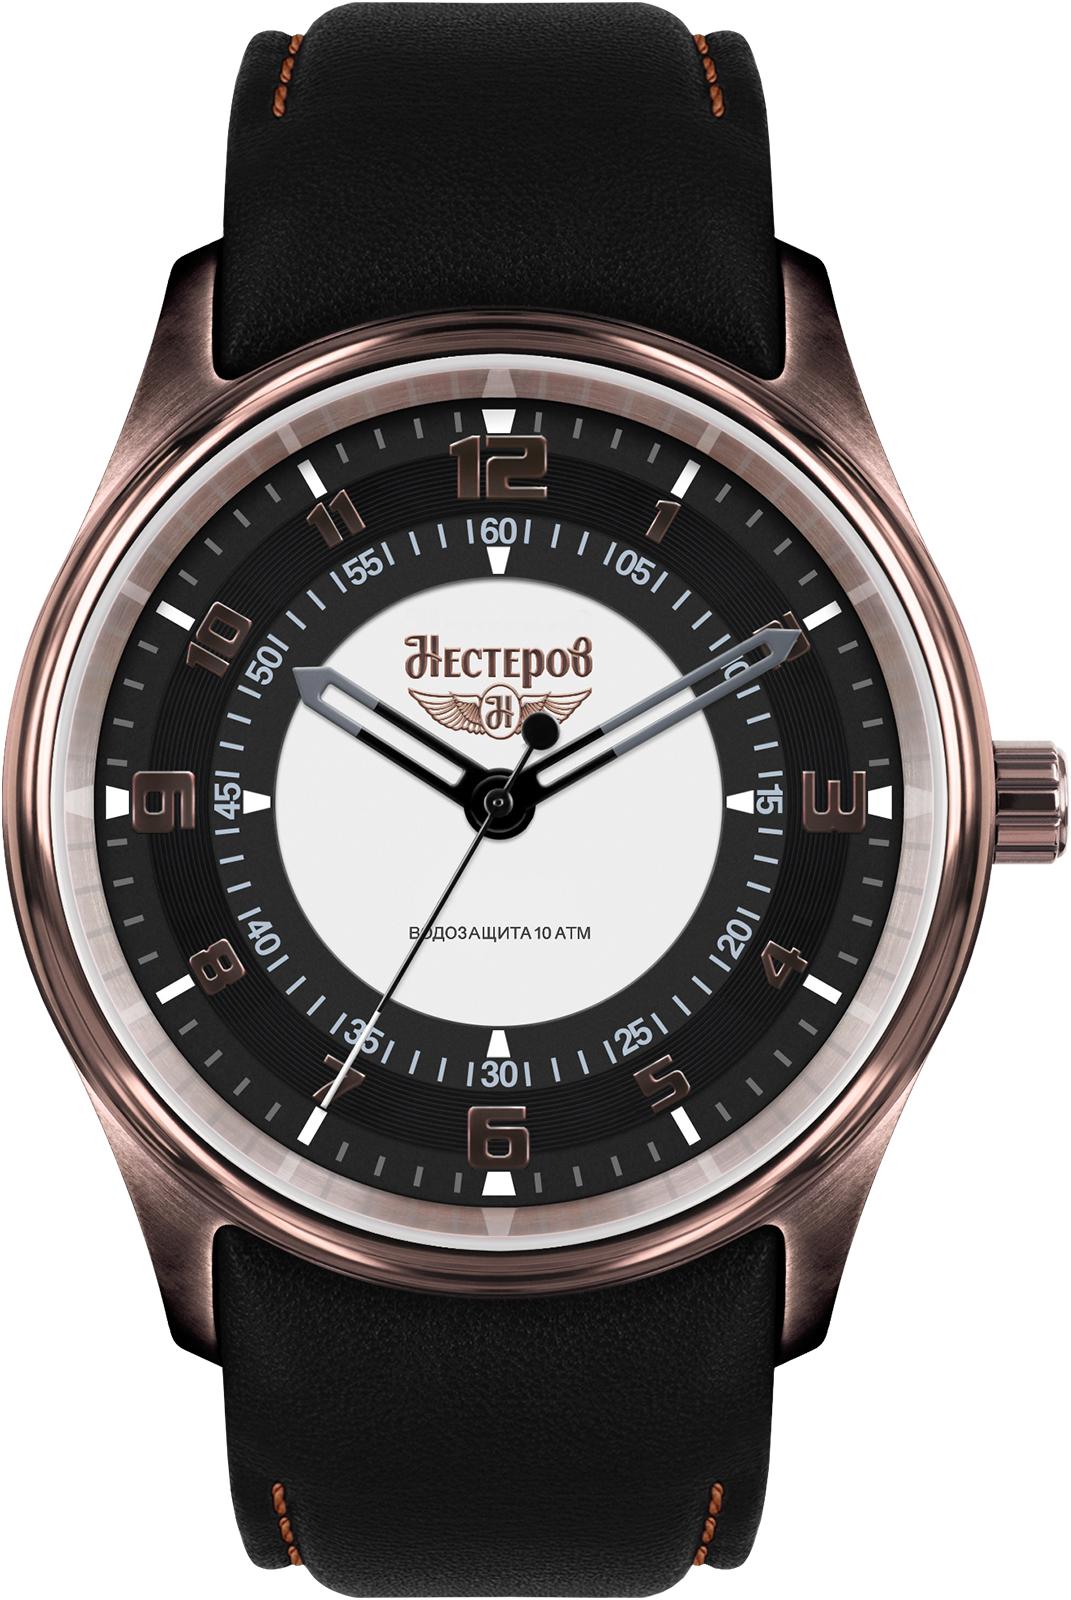 Наручные часы Нестеров H0273B72-05EBR наручные мужские часы тяжелые